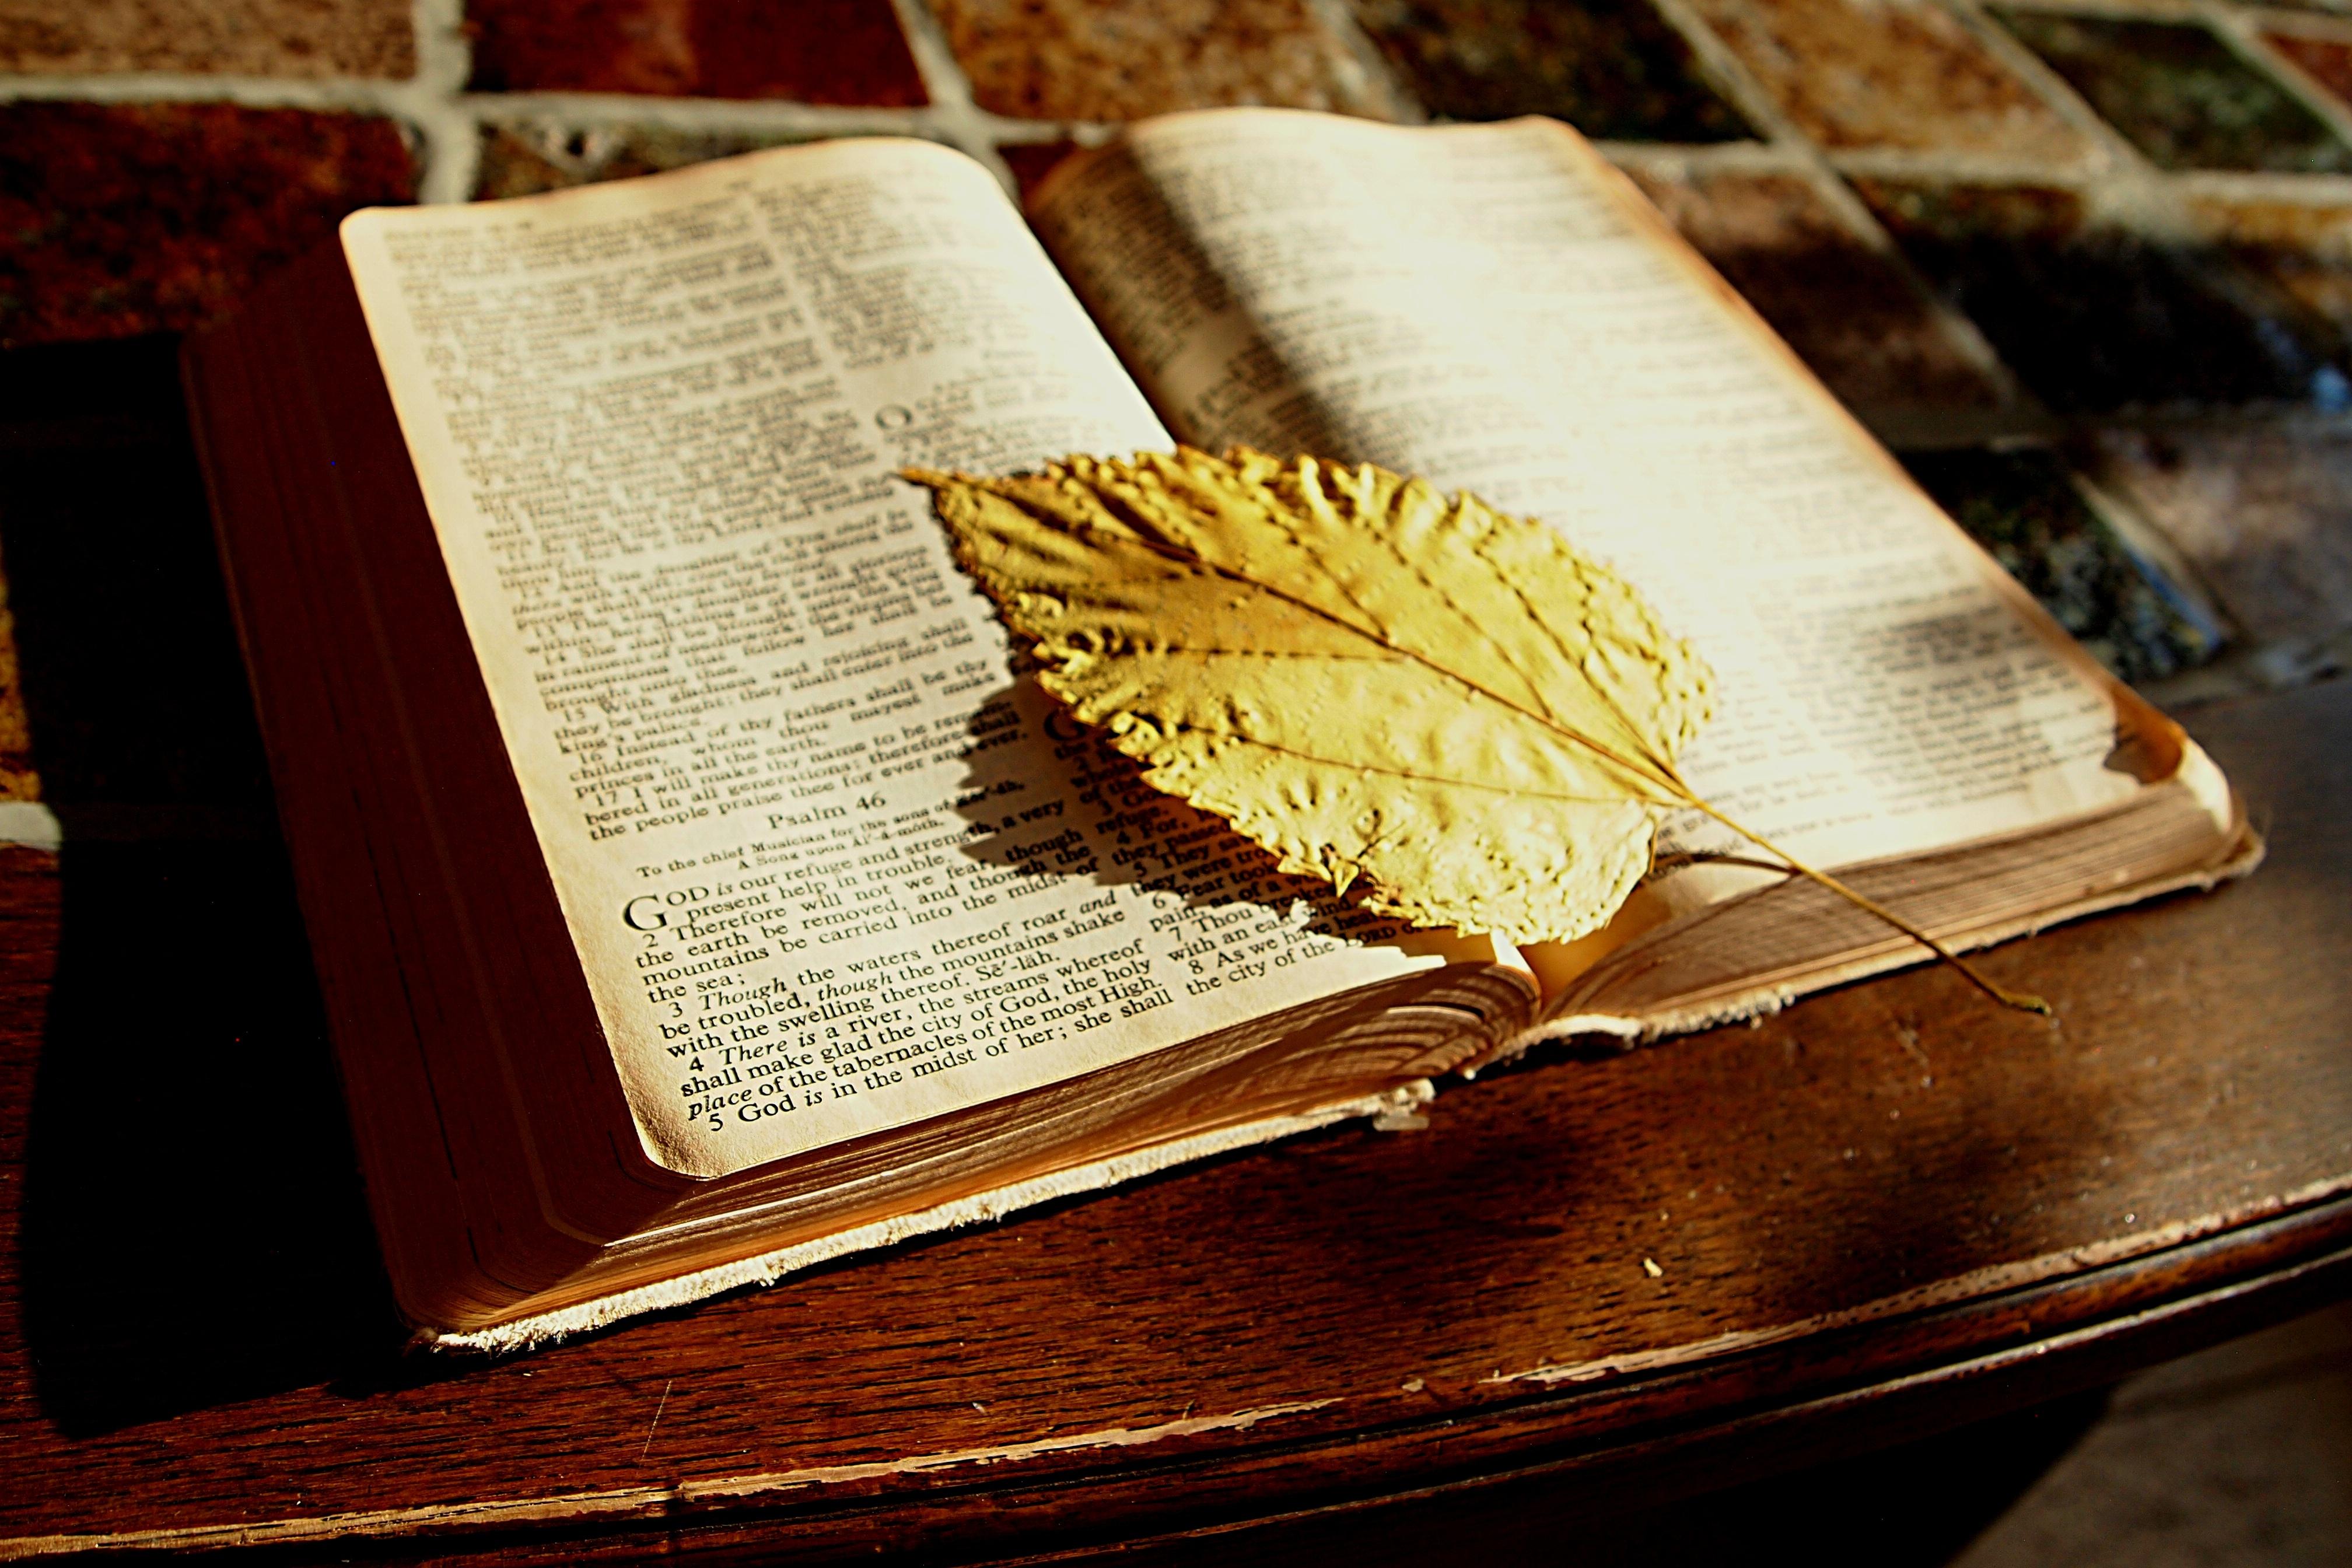 Fotos gratis : escritura, mesa, libro, leer, madera, hoja, cristiano ...